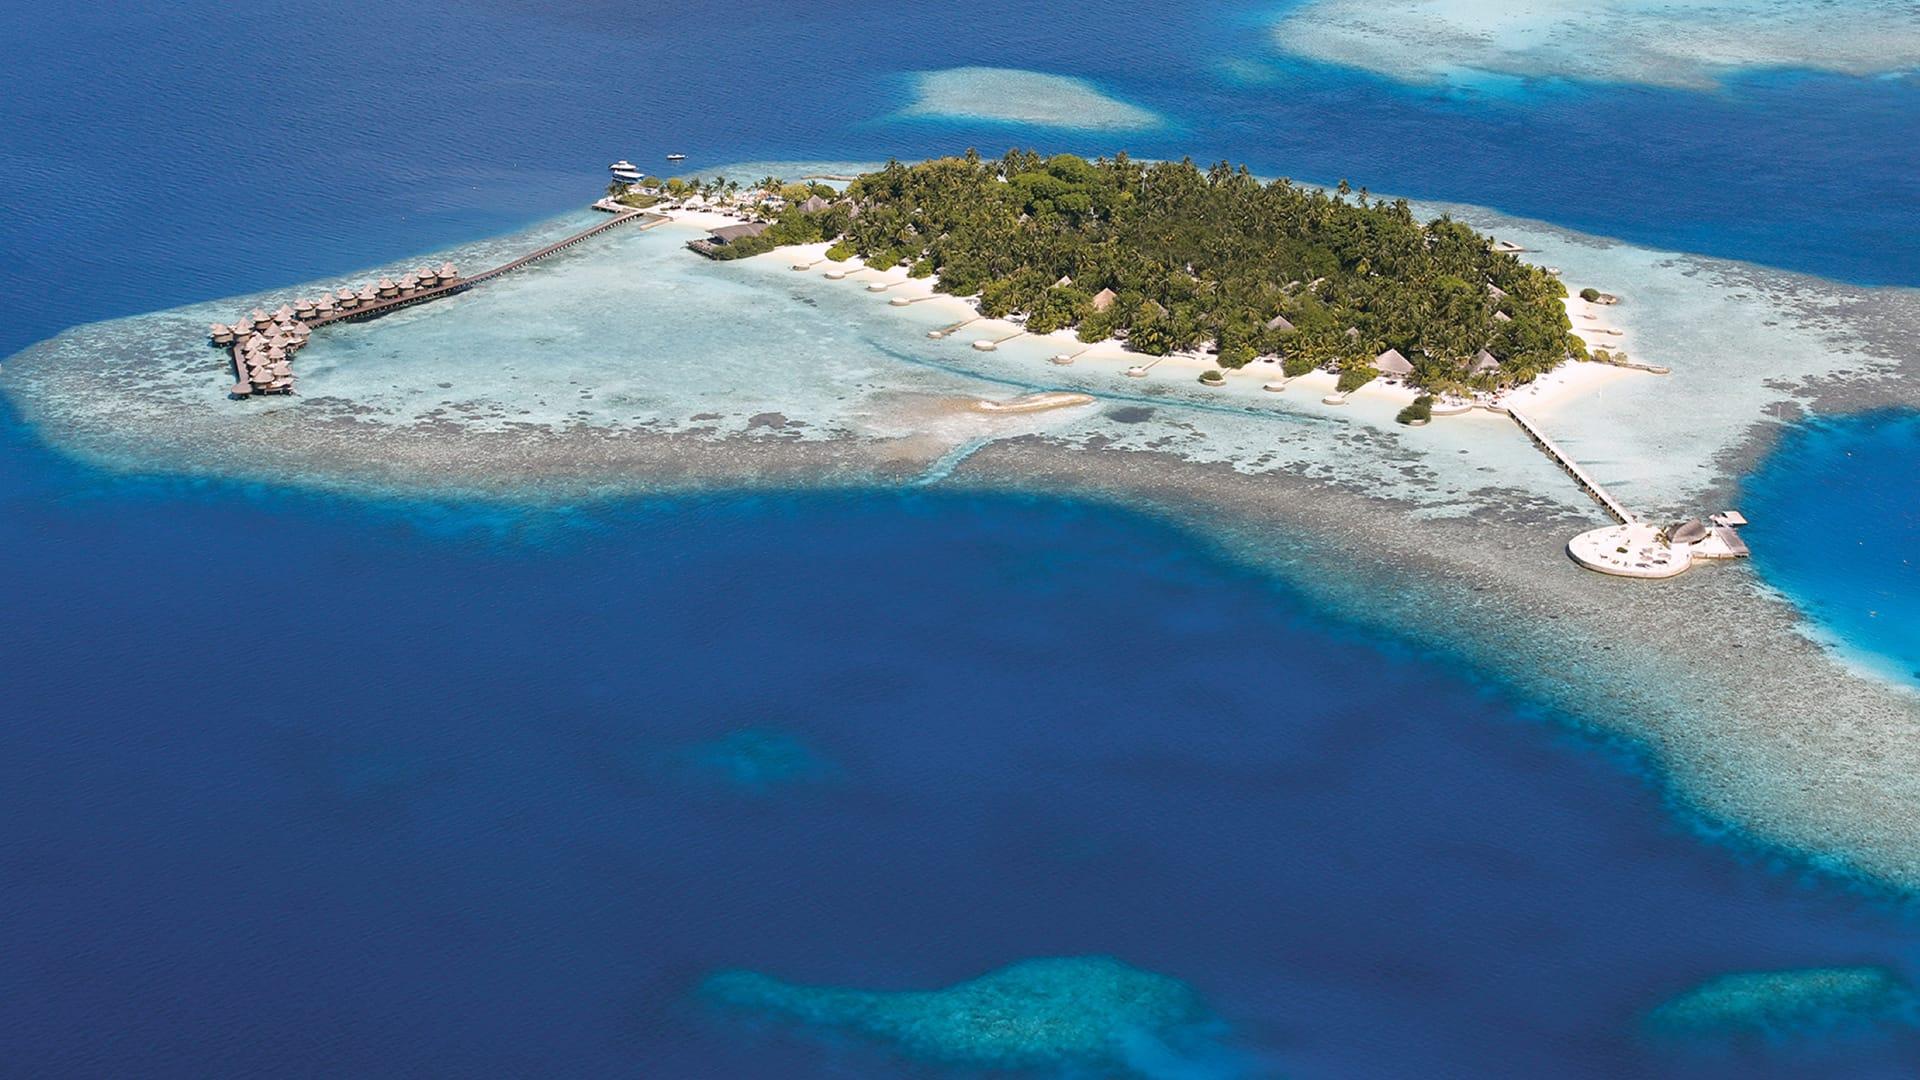 Nika Island Resort Ari Atoll Nika Island Resort Ari Atoll